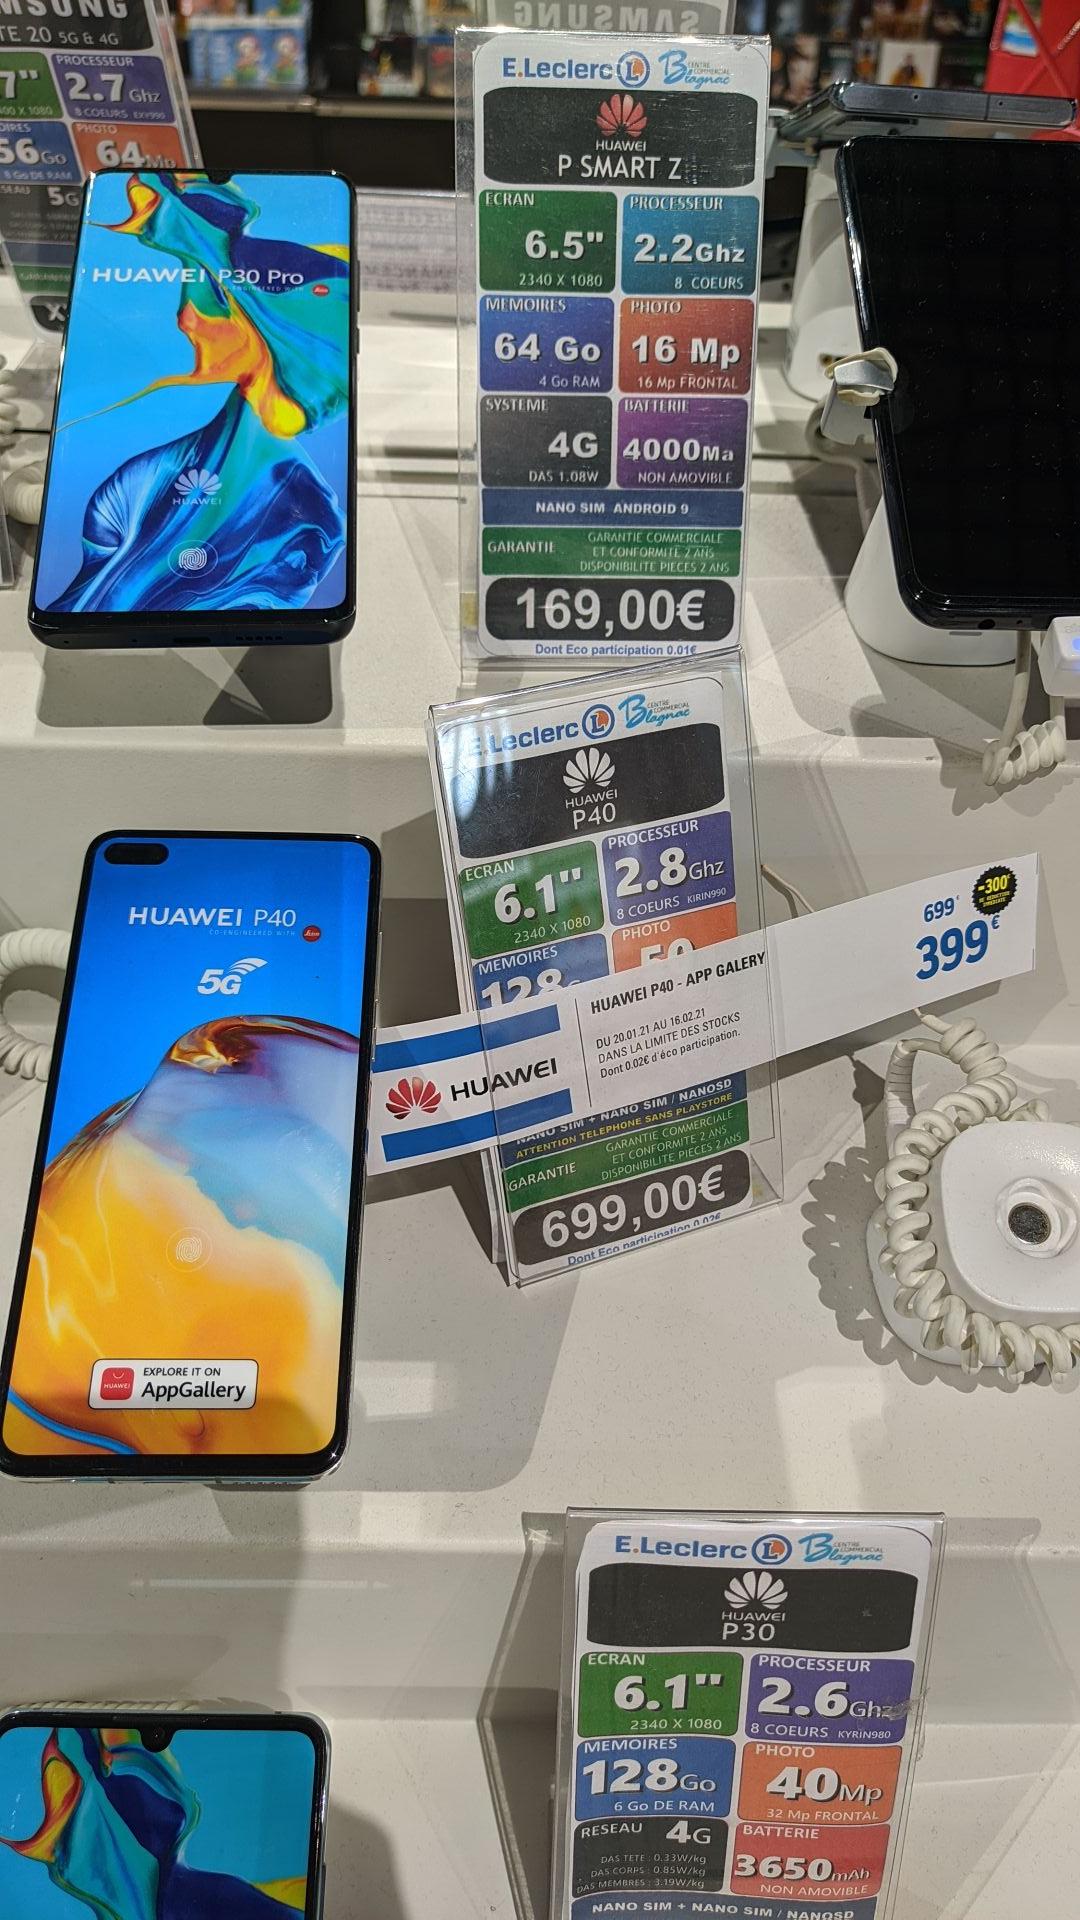 "Smartphone 6.1"" Huawei P40 - full HD+, Kirin 990, 8 Go de RAM, 128 Go, 5G, Sans services Google - Blagnac (31)"